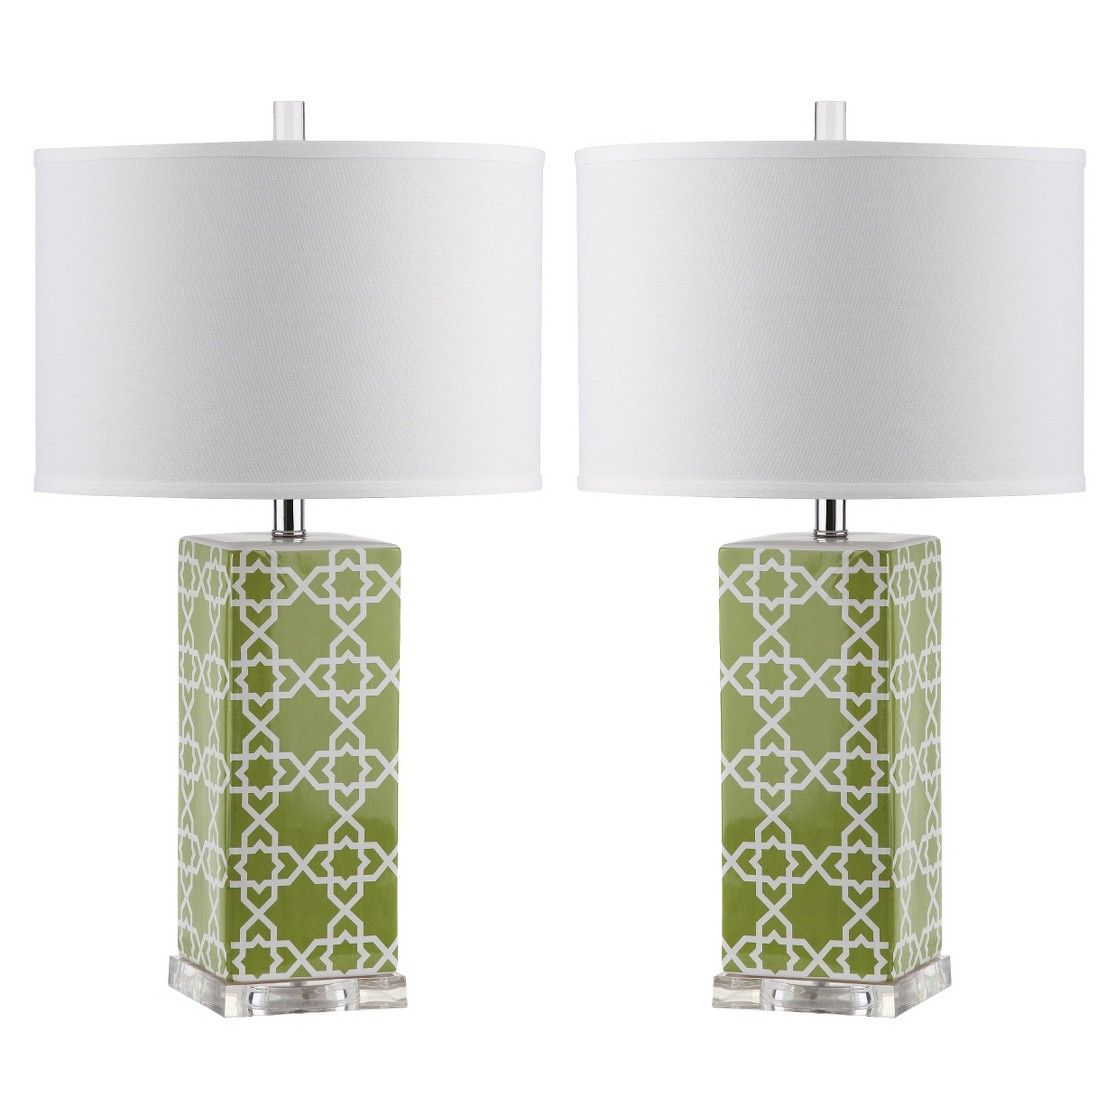 Safavieh Quatrefoil Table Lamp Green (Set of 2) (With